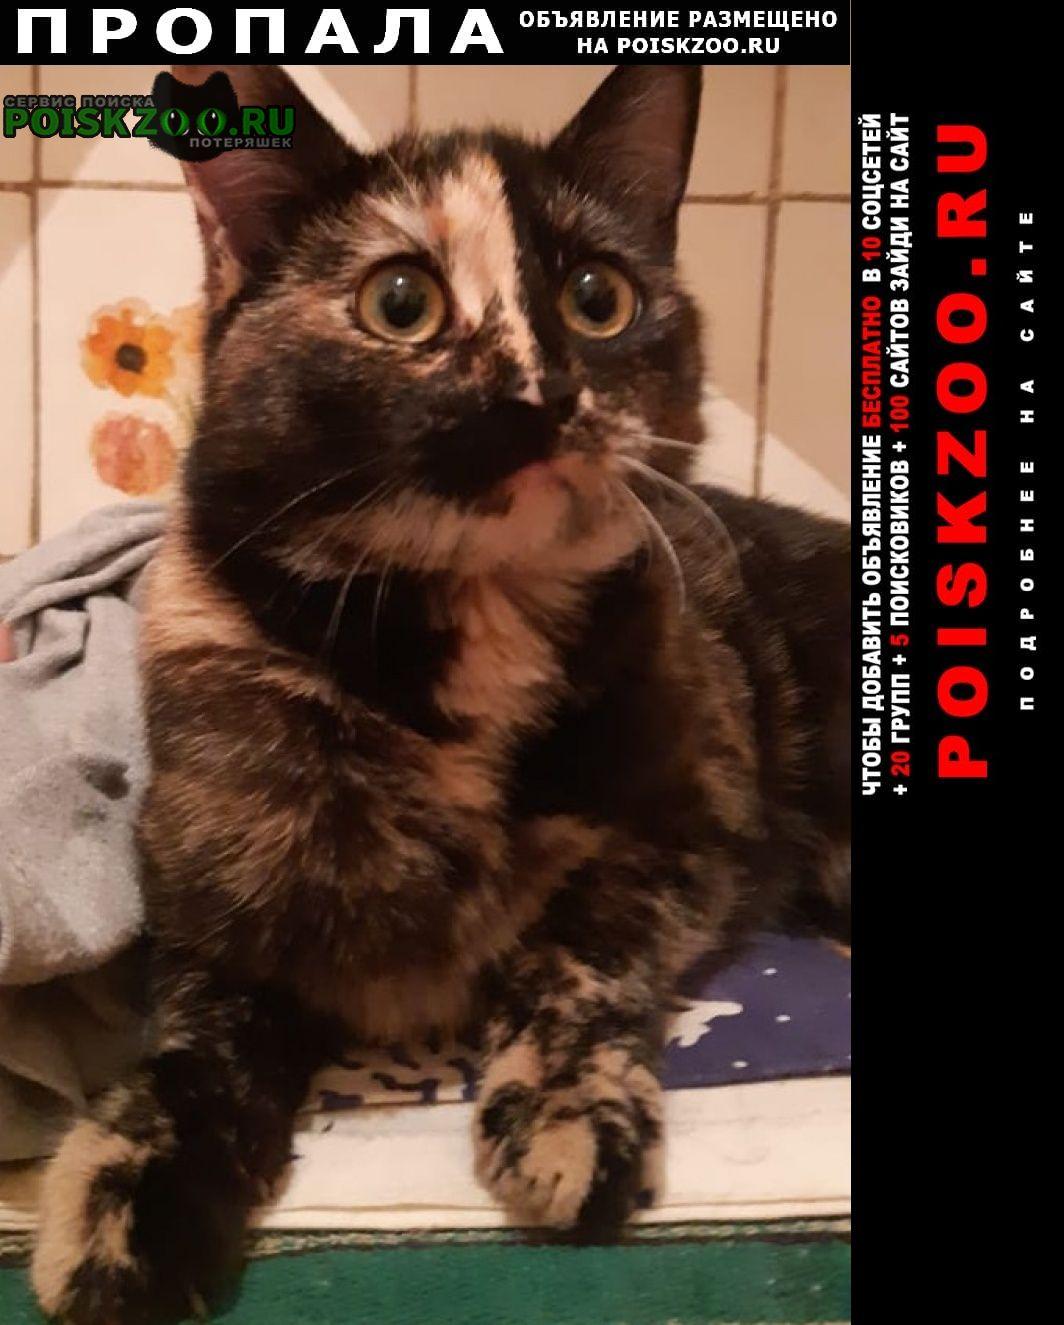 Пропала кошка в районе метро парк культуры. Москва